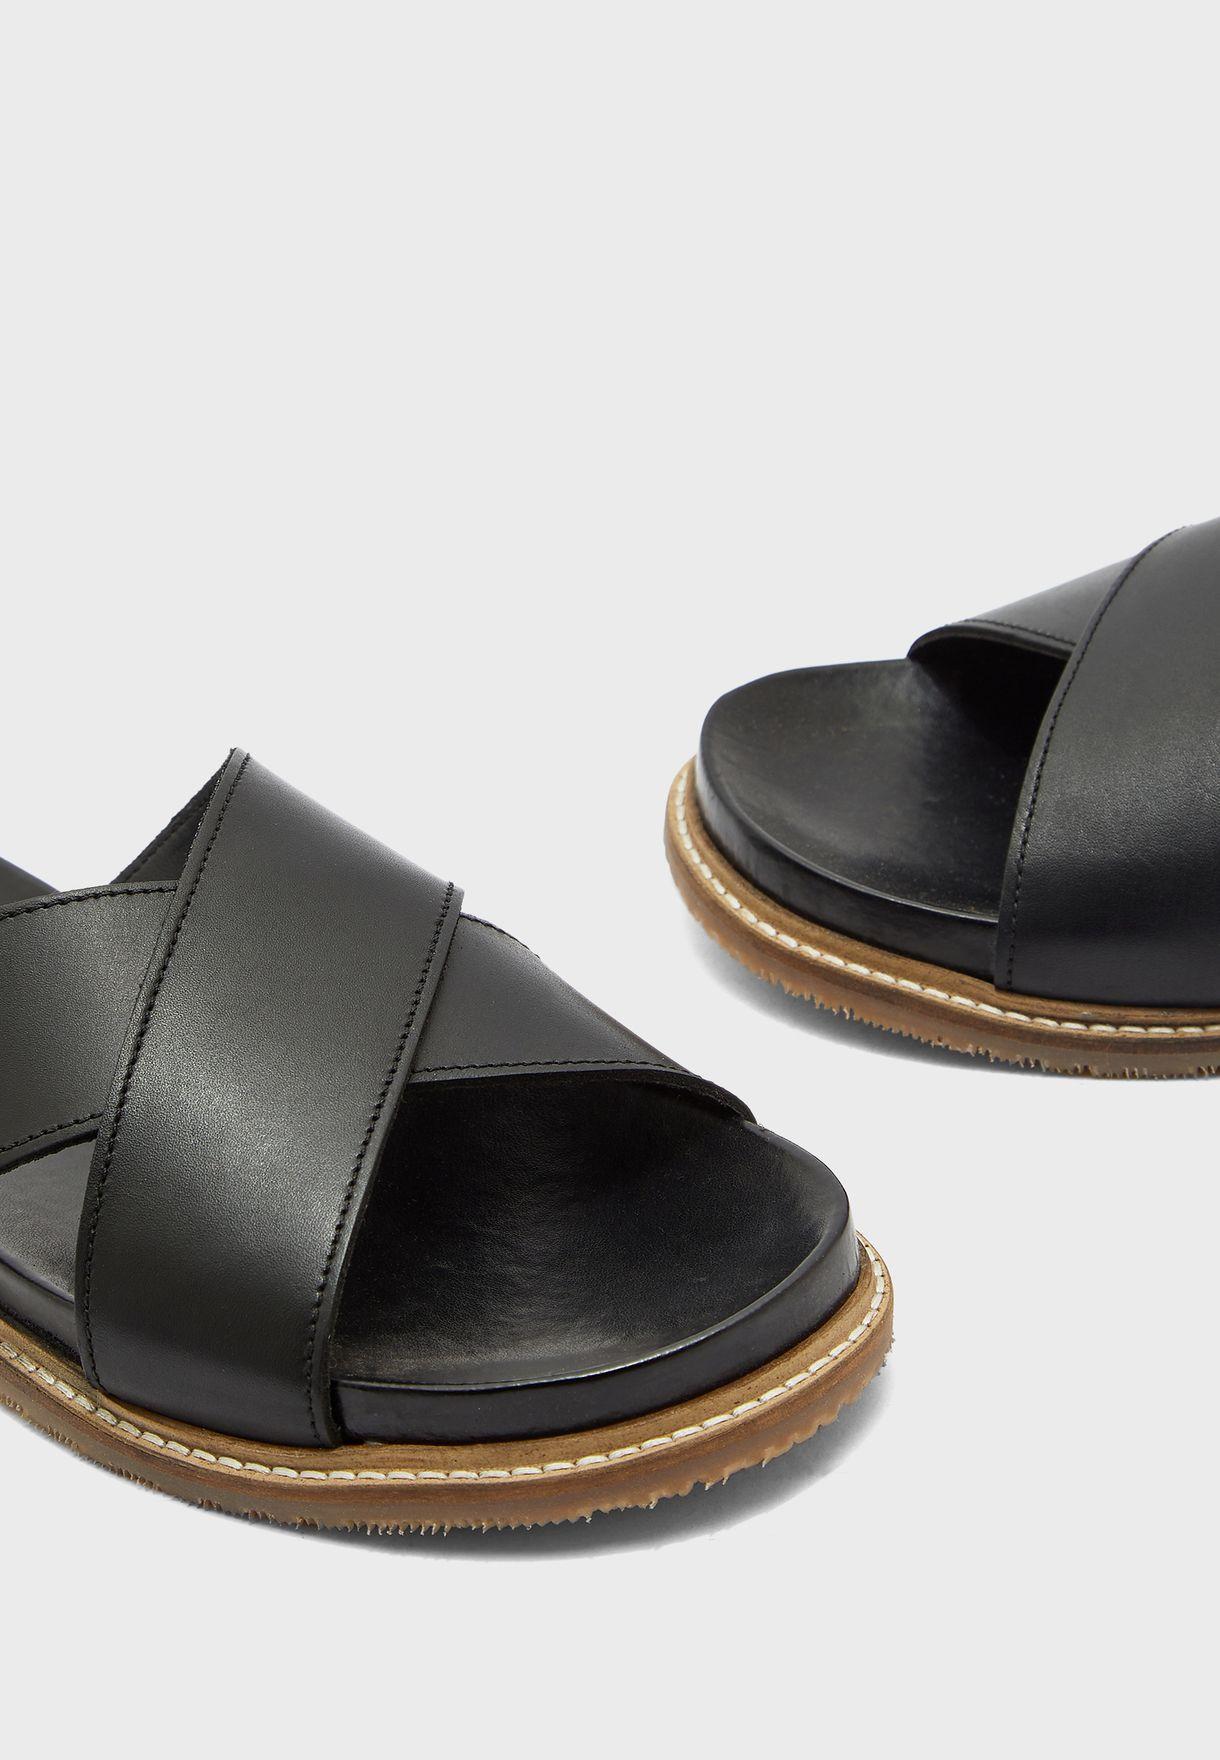 Rea-N Cross Strap Slip On Sandals